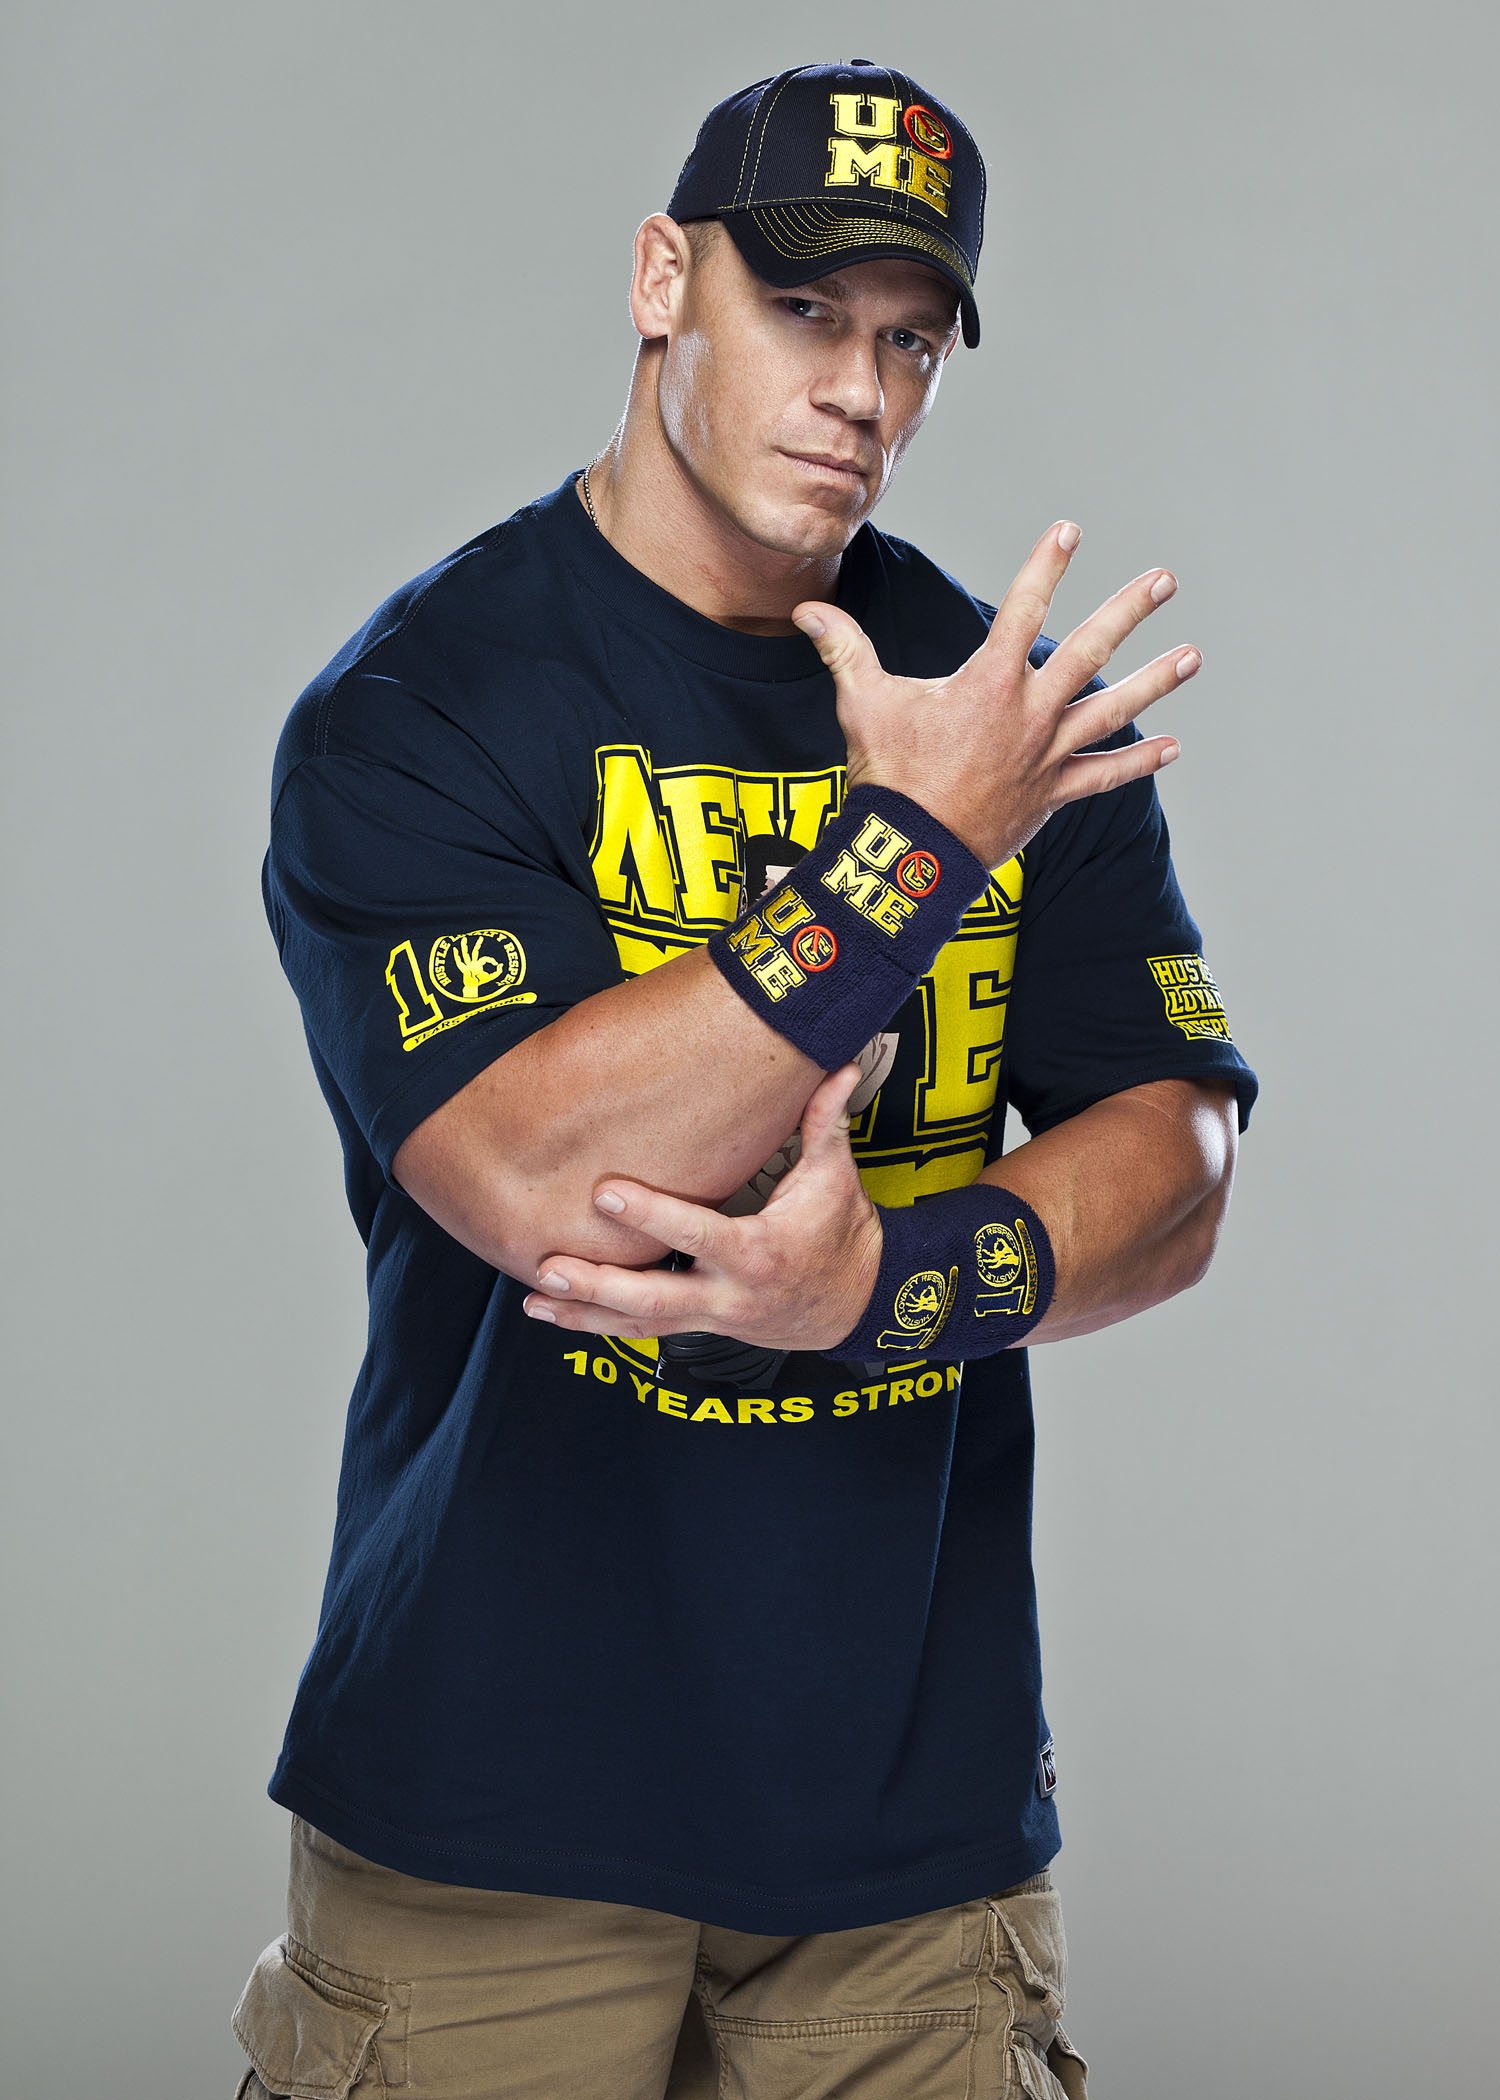 WWE John Cena 2013 | EclipseMagazineJohn Cena Wwe Champion 2013 Champ Is Here